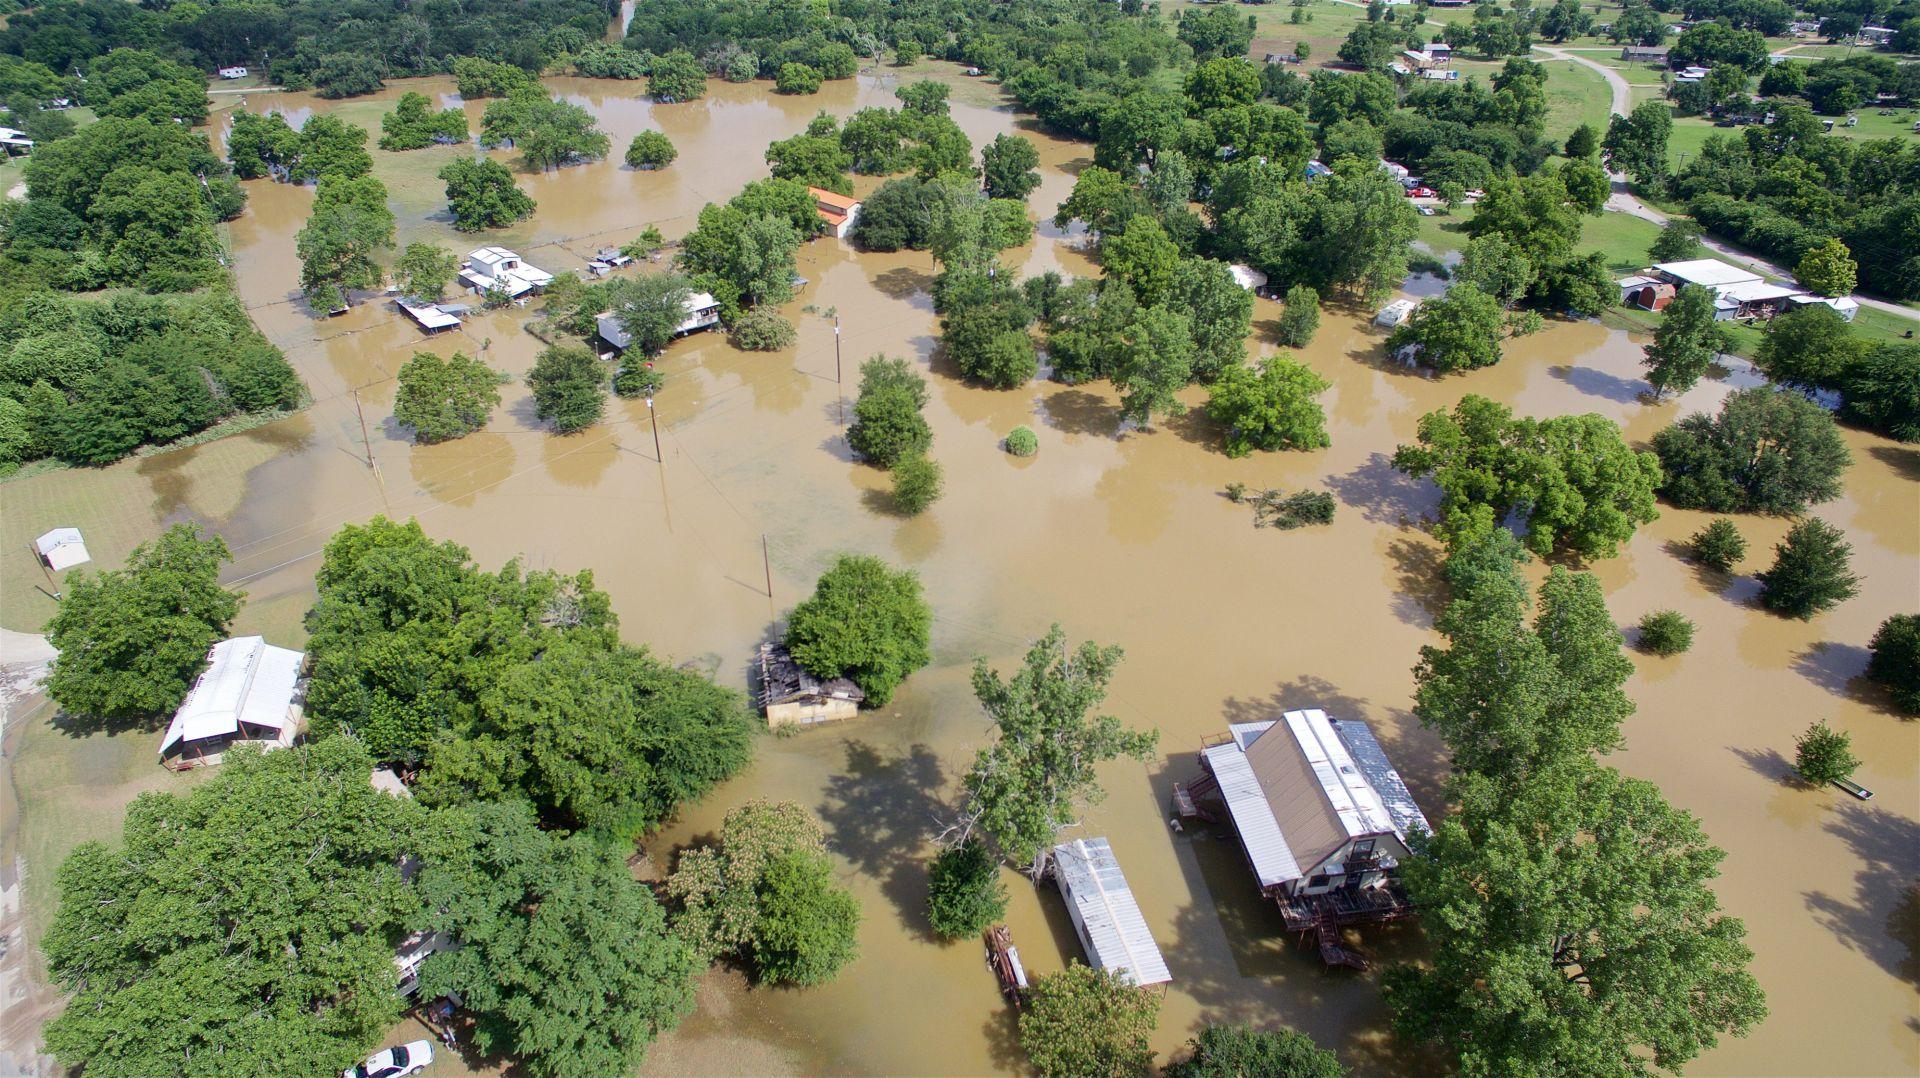 JAKE KIŠE: Nakon Teksasa, poplave prijete Louisiani i Mississippiju